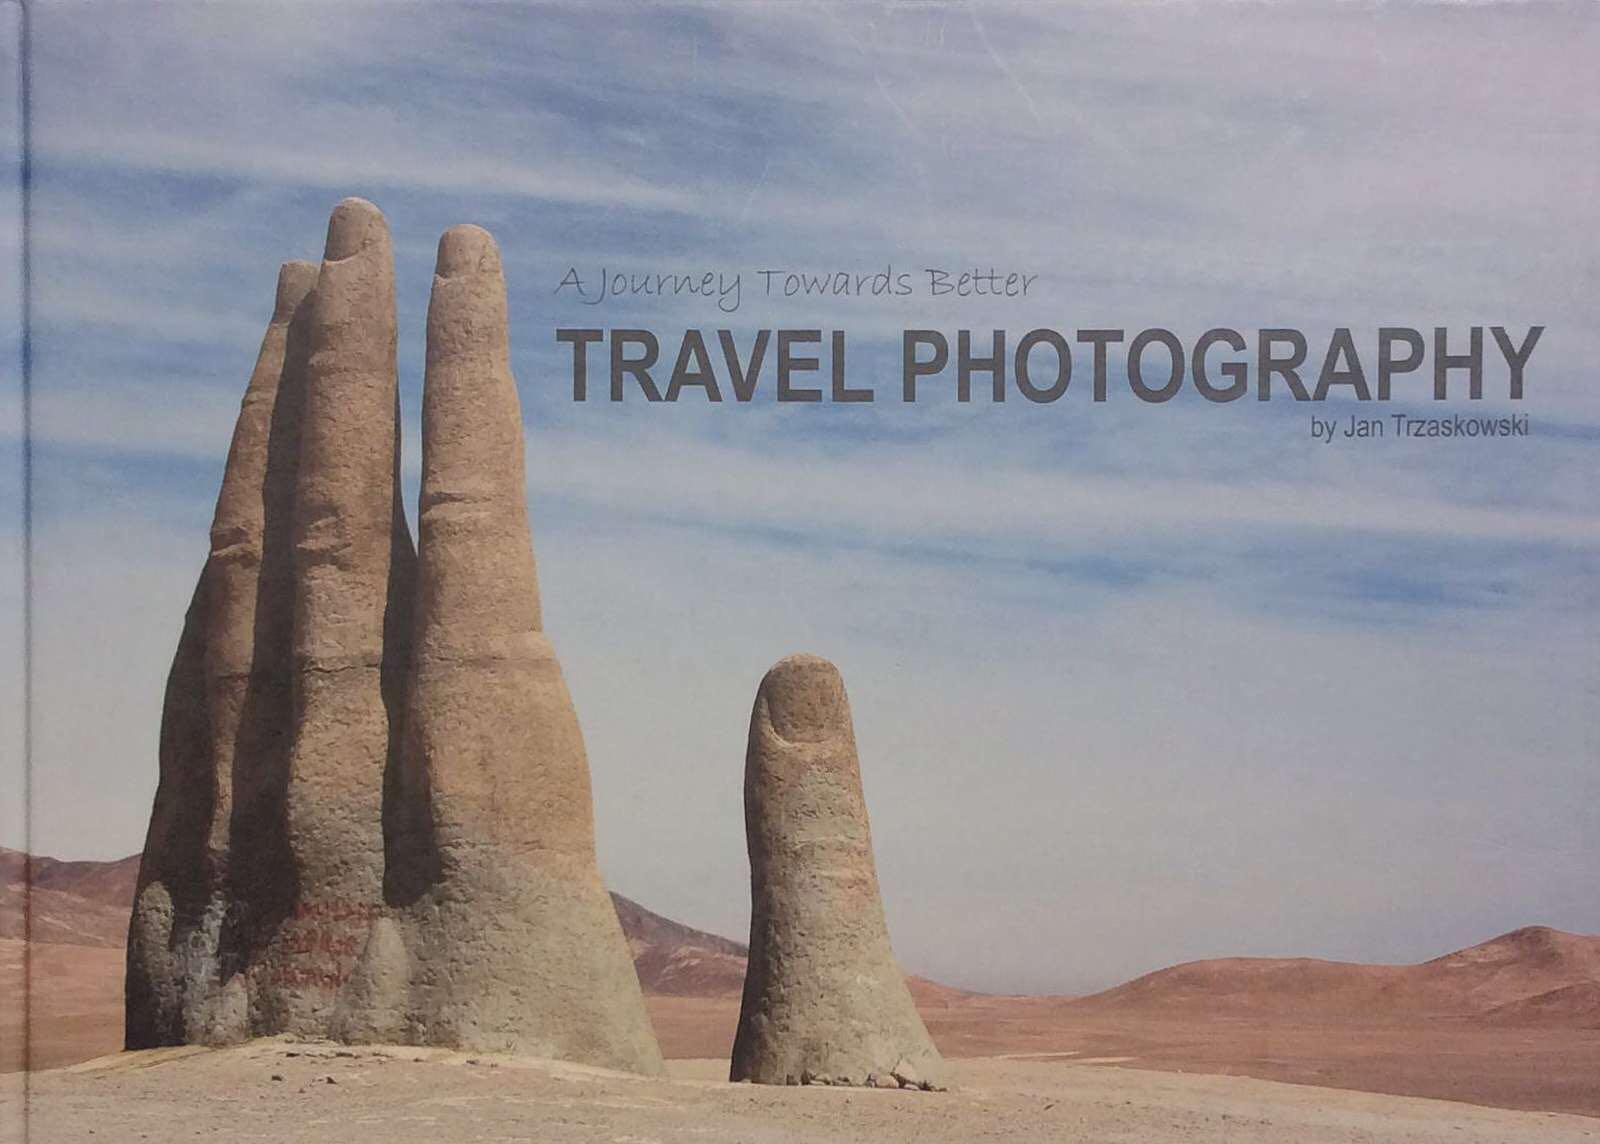 Trzaskowski,Jan. A journey towards better Travel Photography